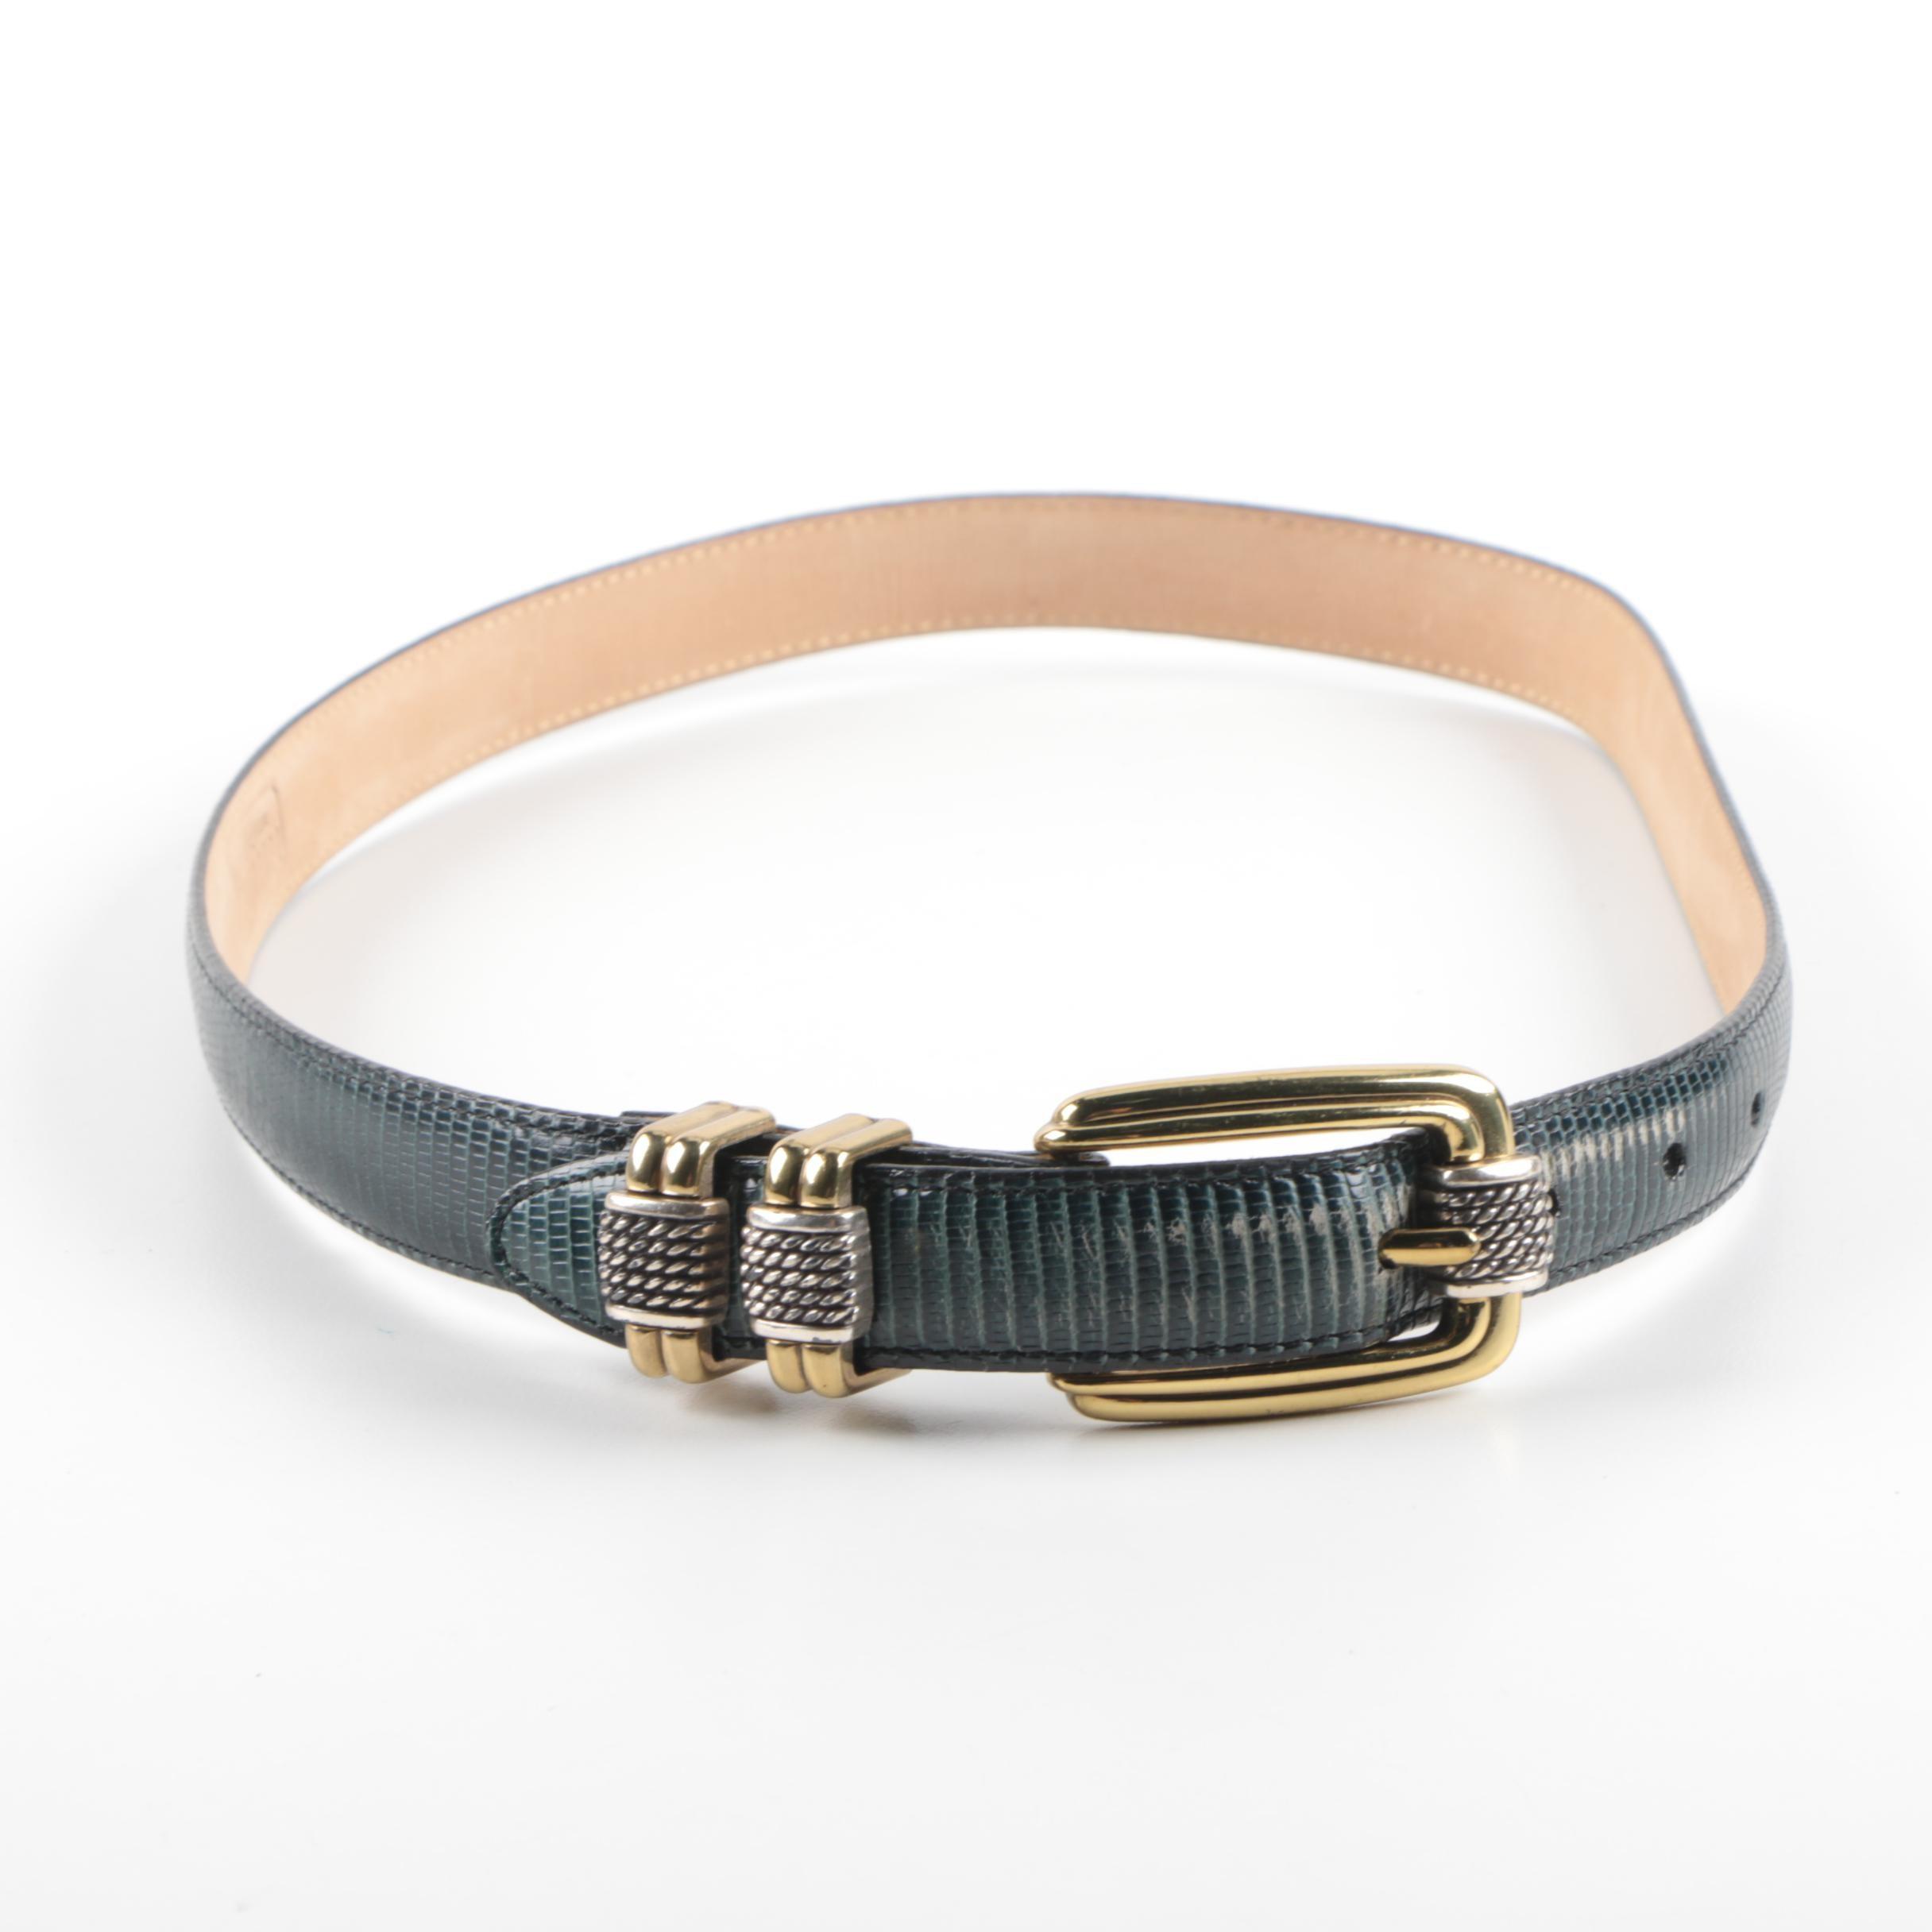 Women's Brighton Classics Leather and Metal Belt